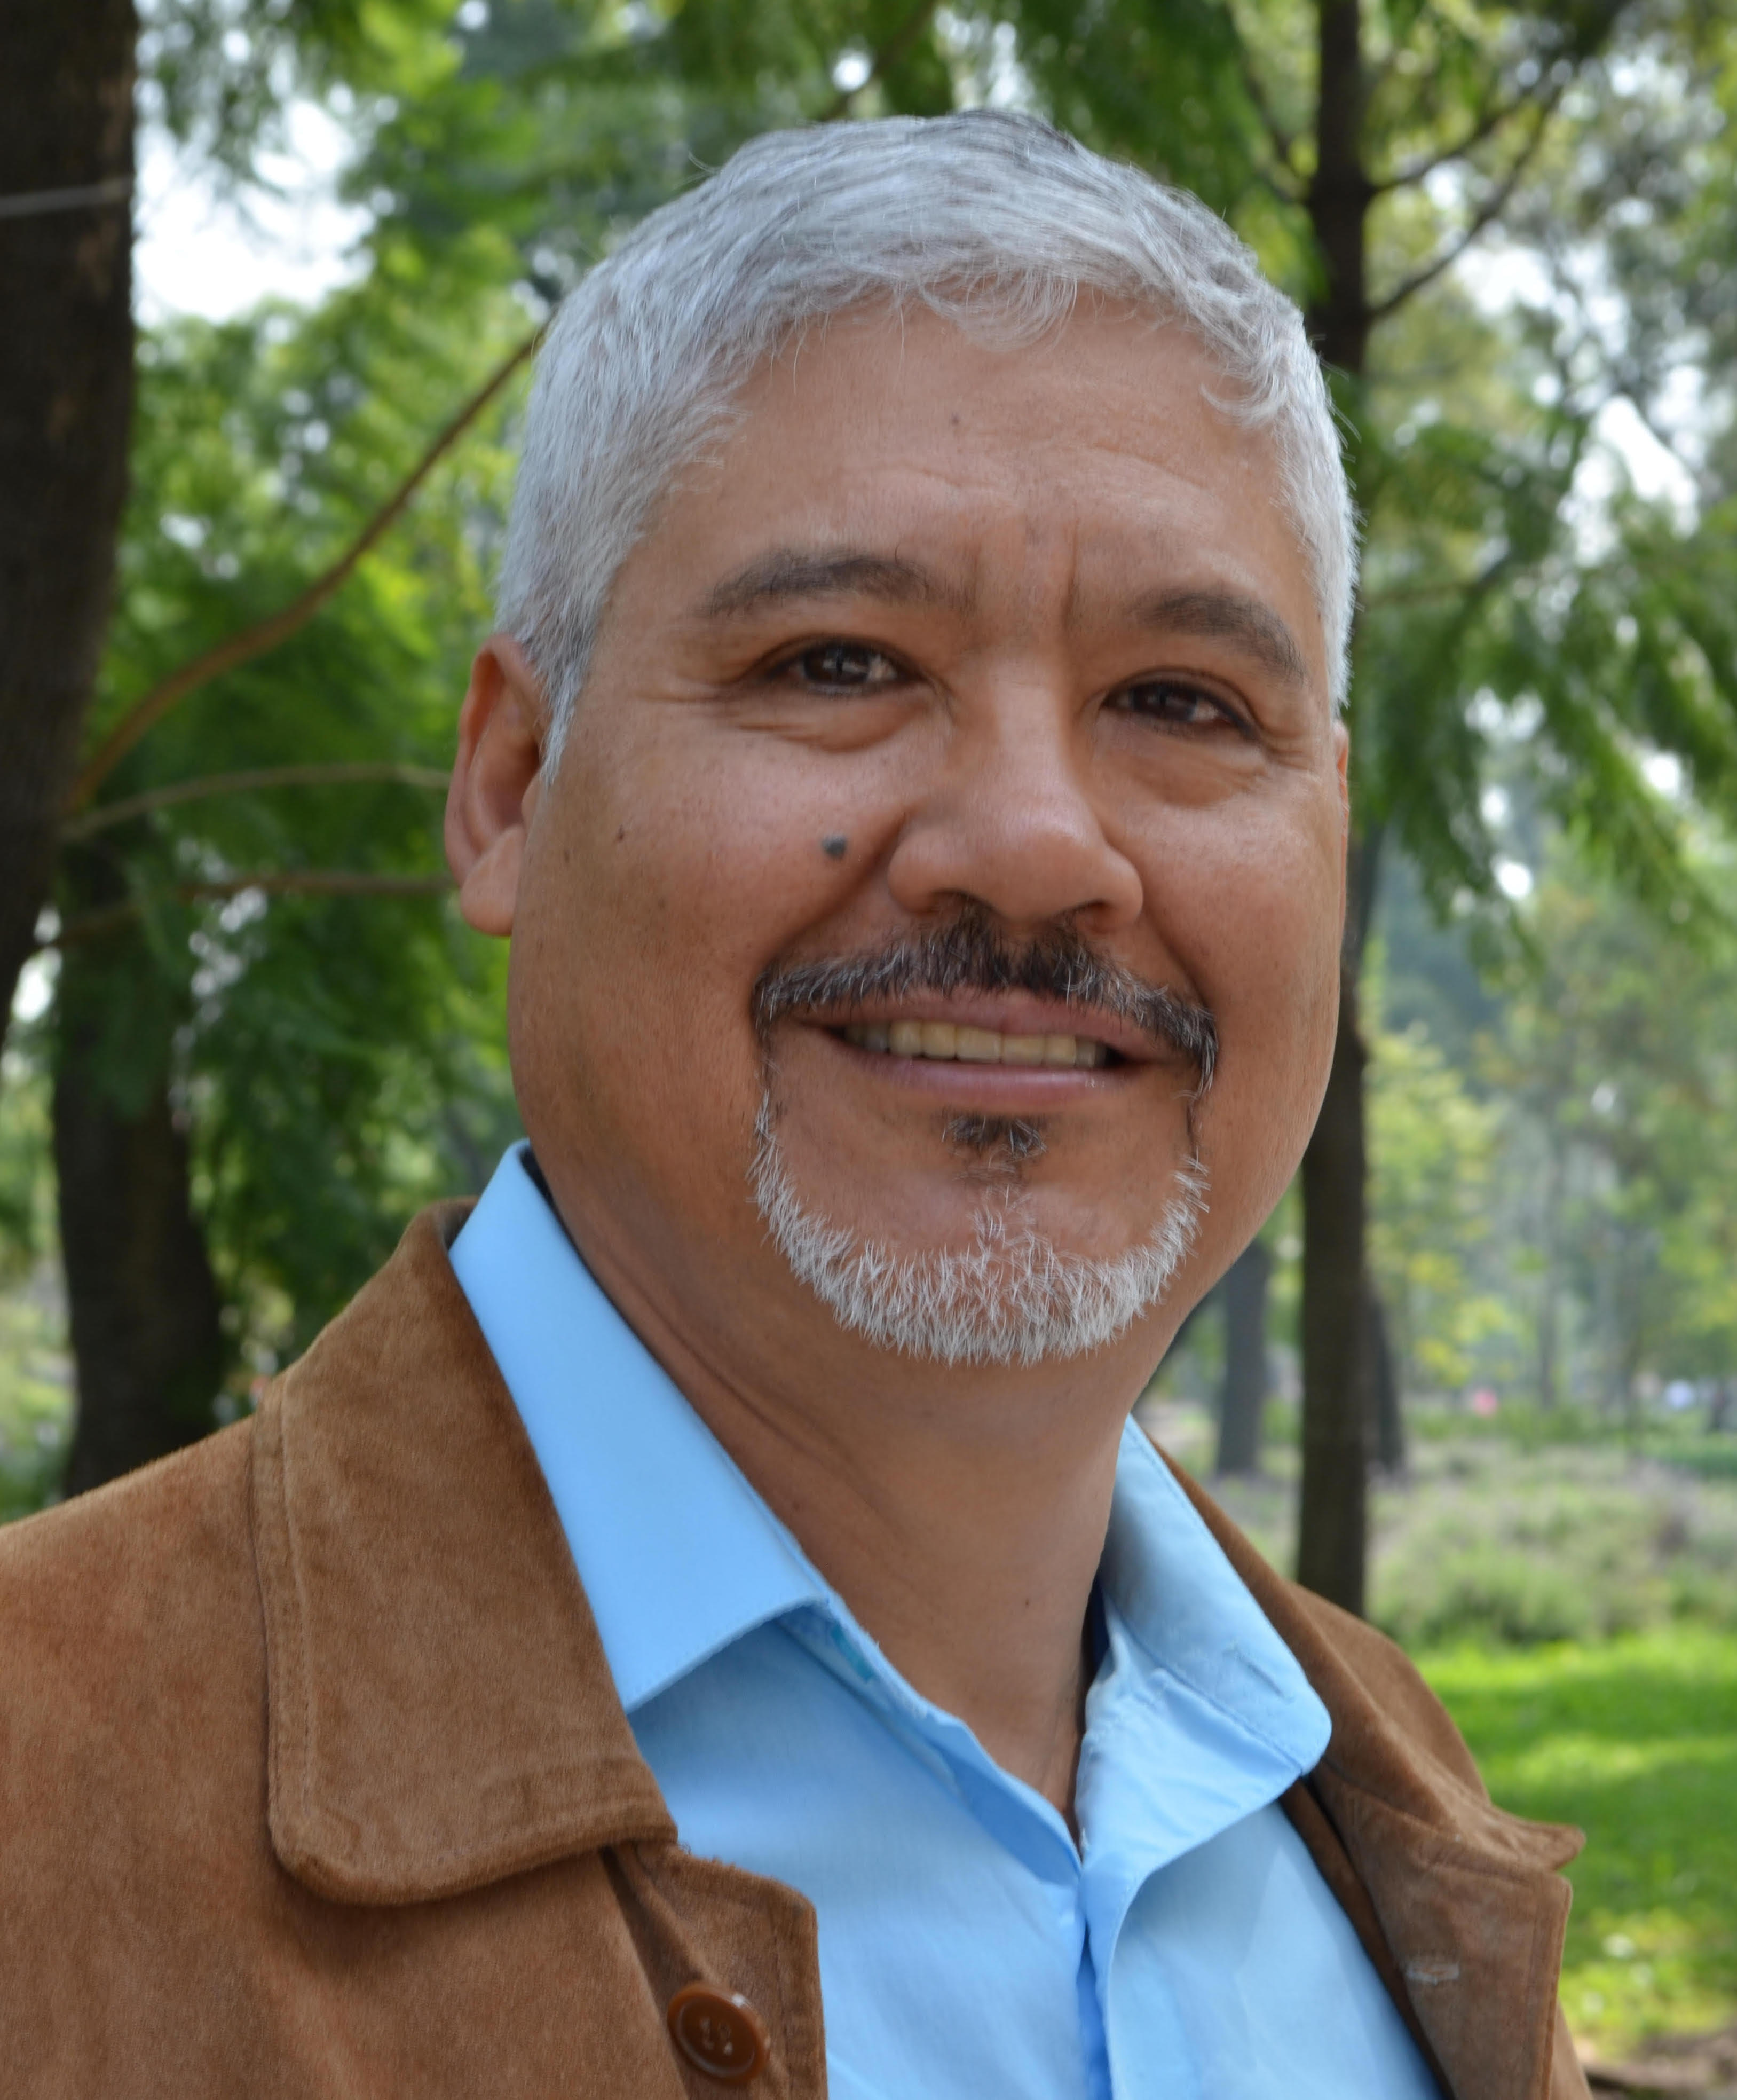 Hector Dominguez Ruvalcaba